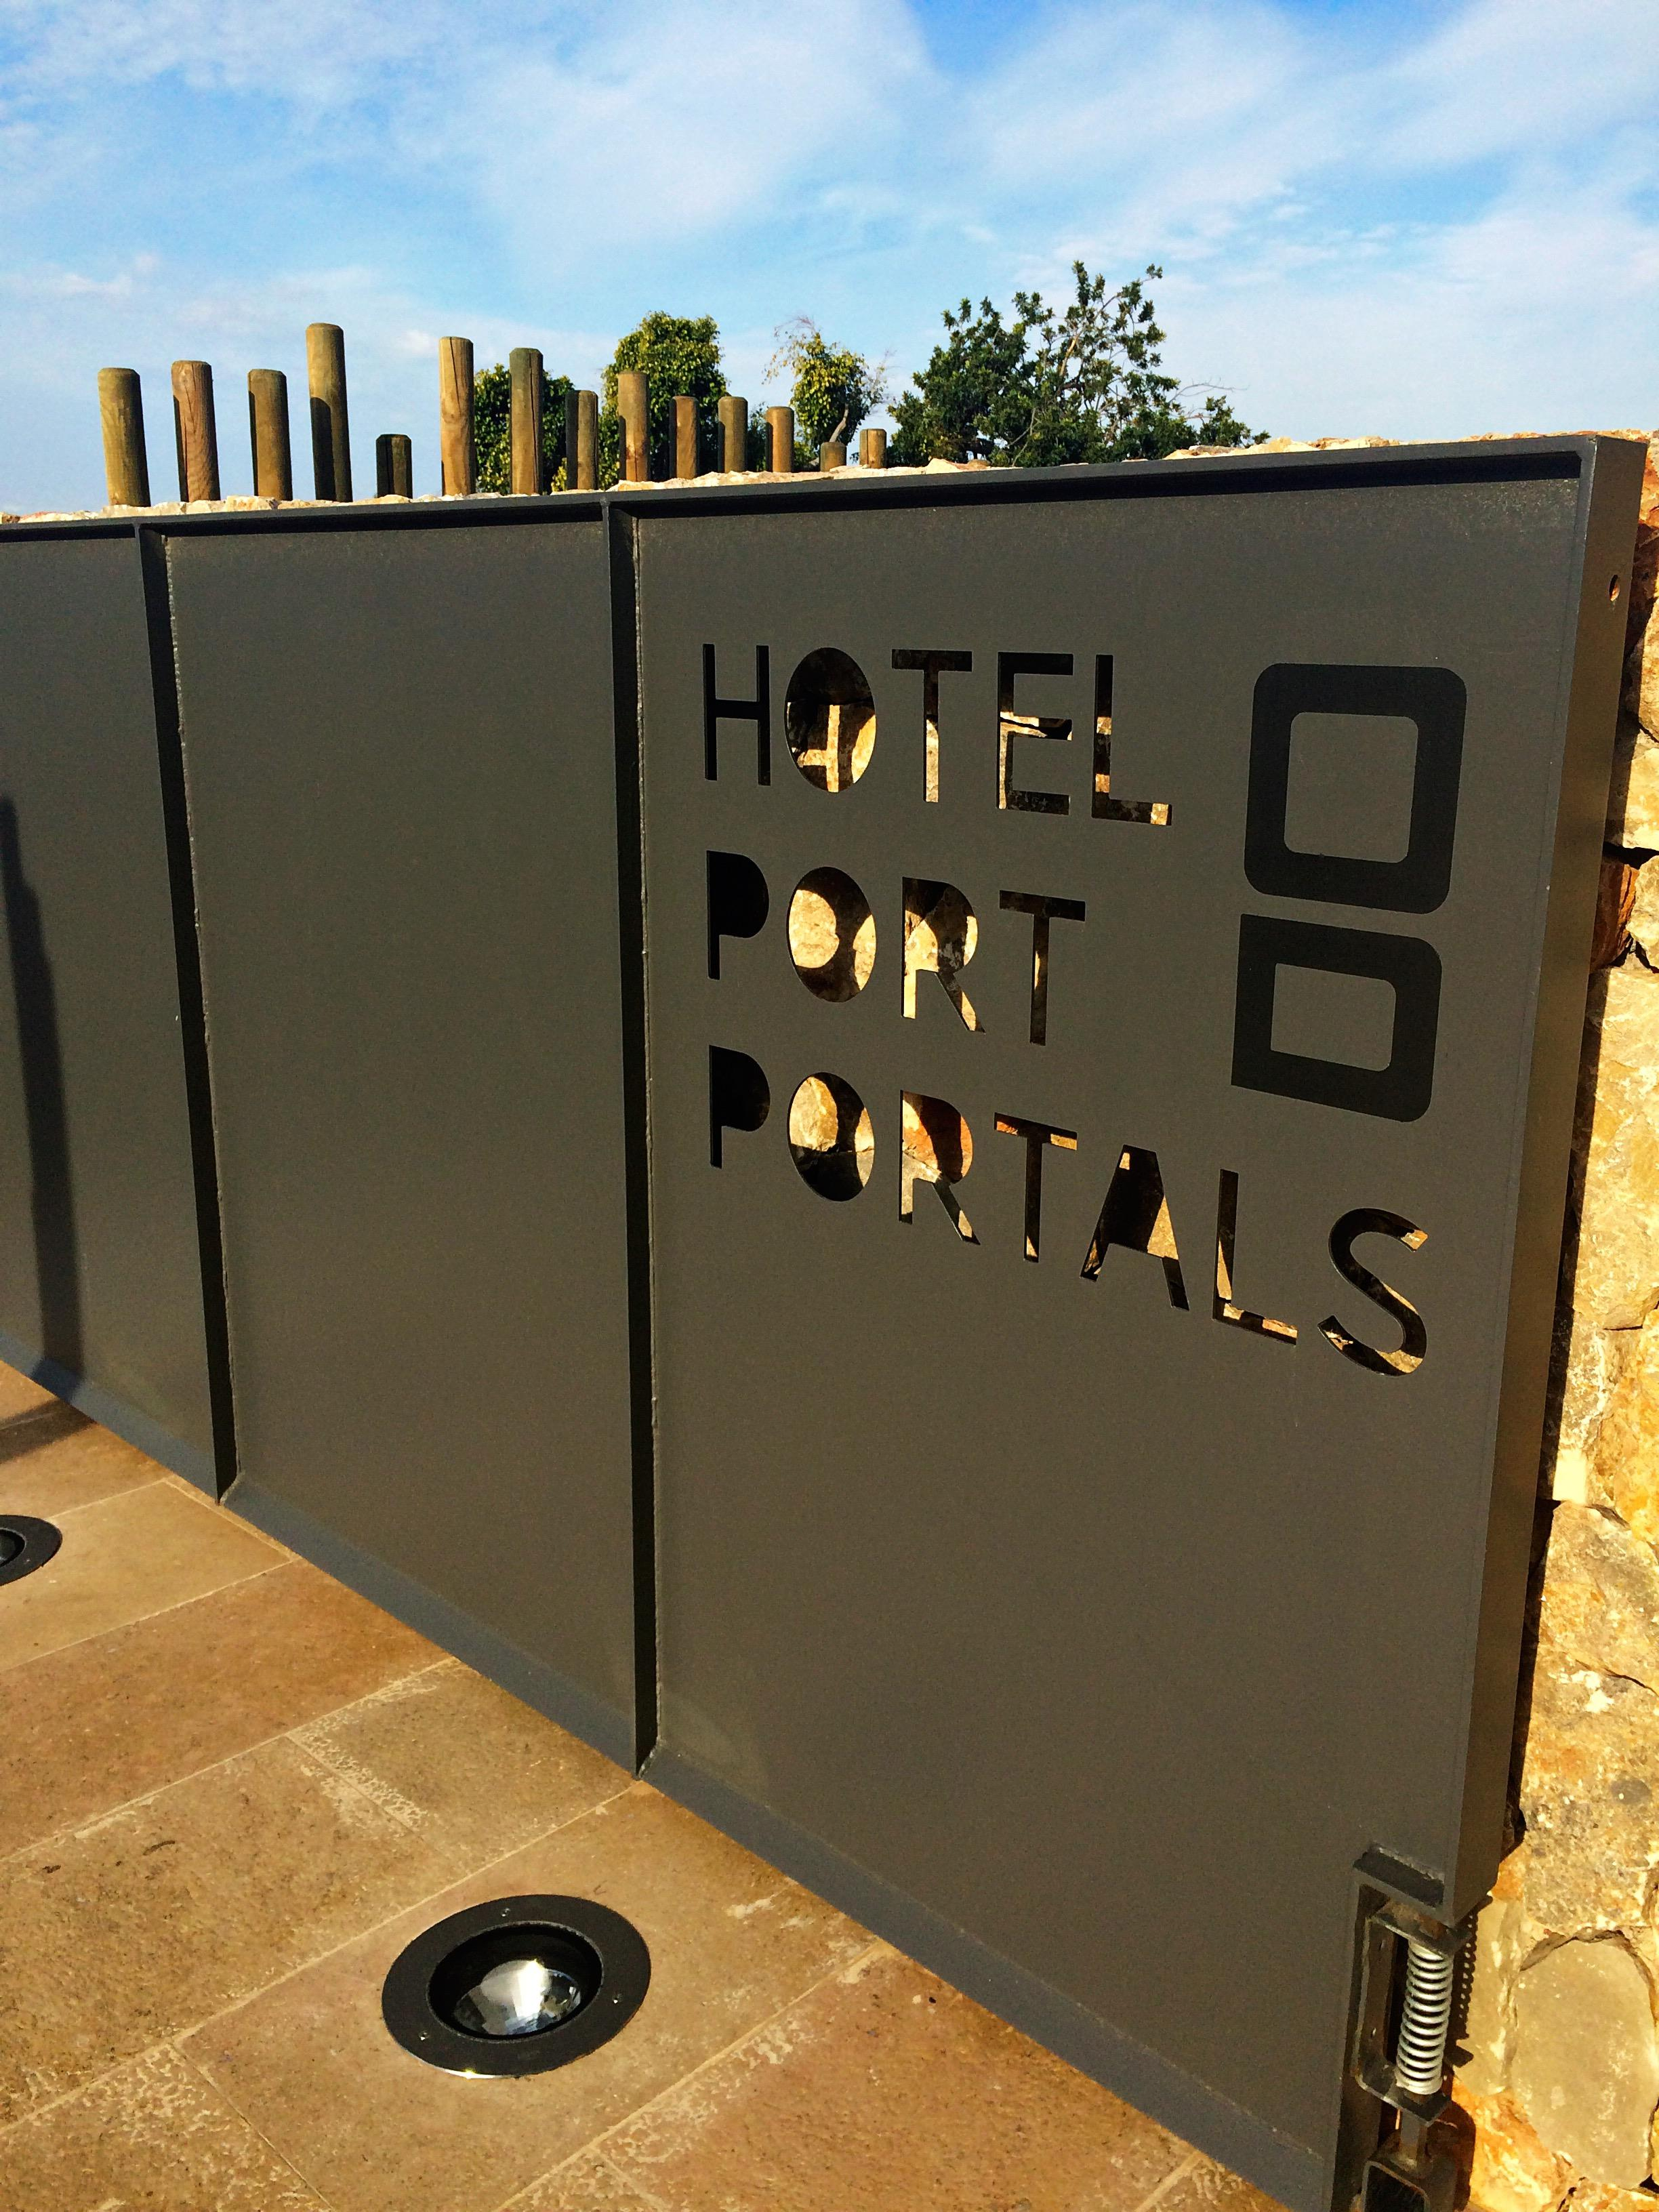 Mein perfektes Mallorca Wochenende staedtereisen sonne land und leute mallorca familie europa  tui berlin mallorca hotel port portals